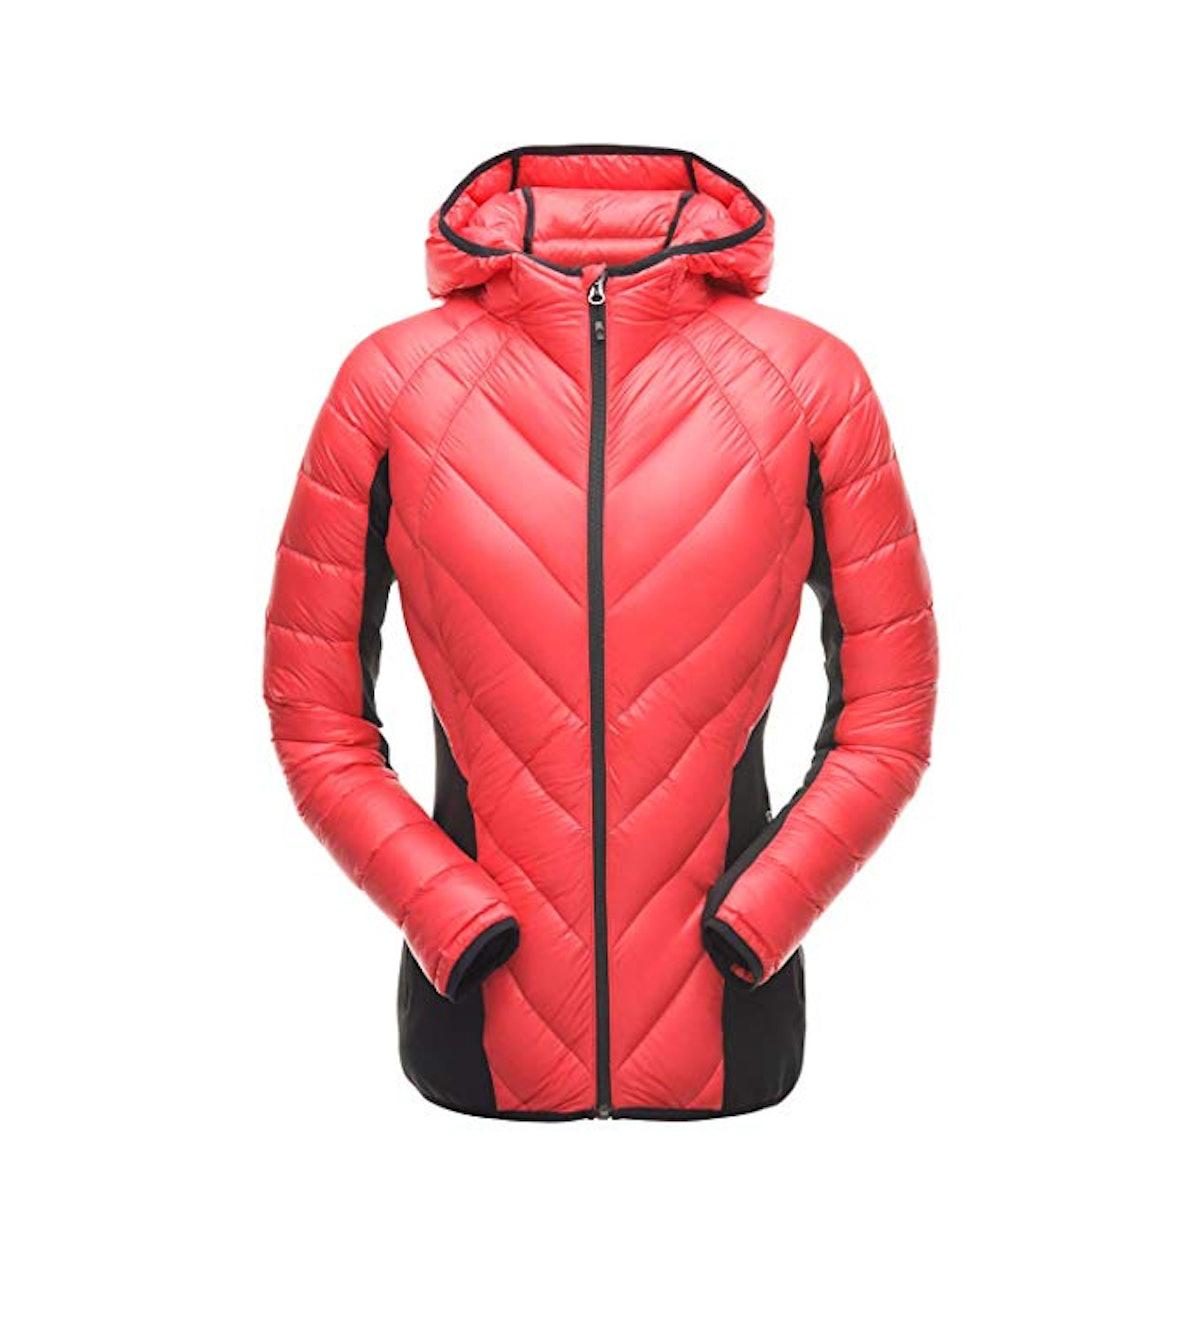 SPYDER Women's Syrround Waterproof Down Jacket